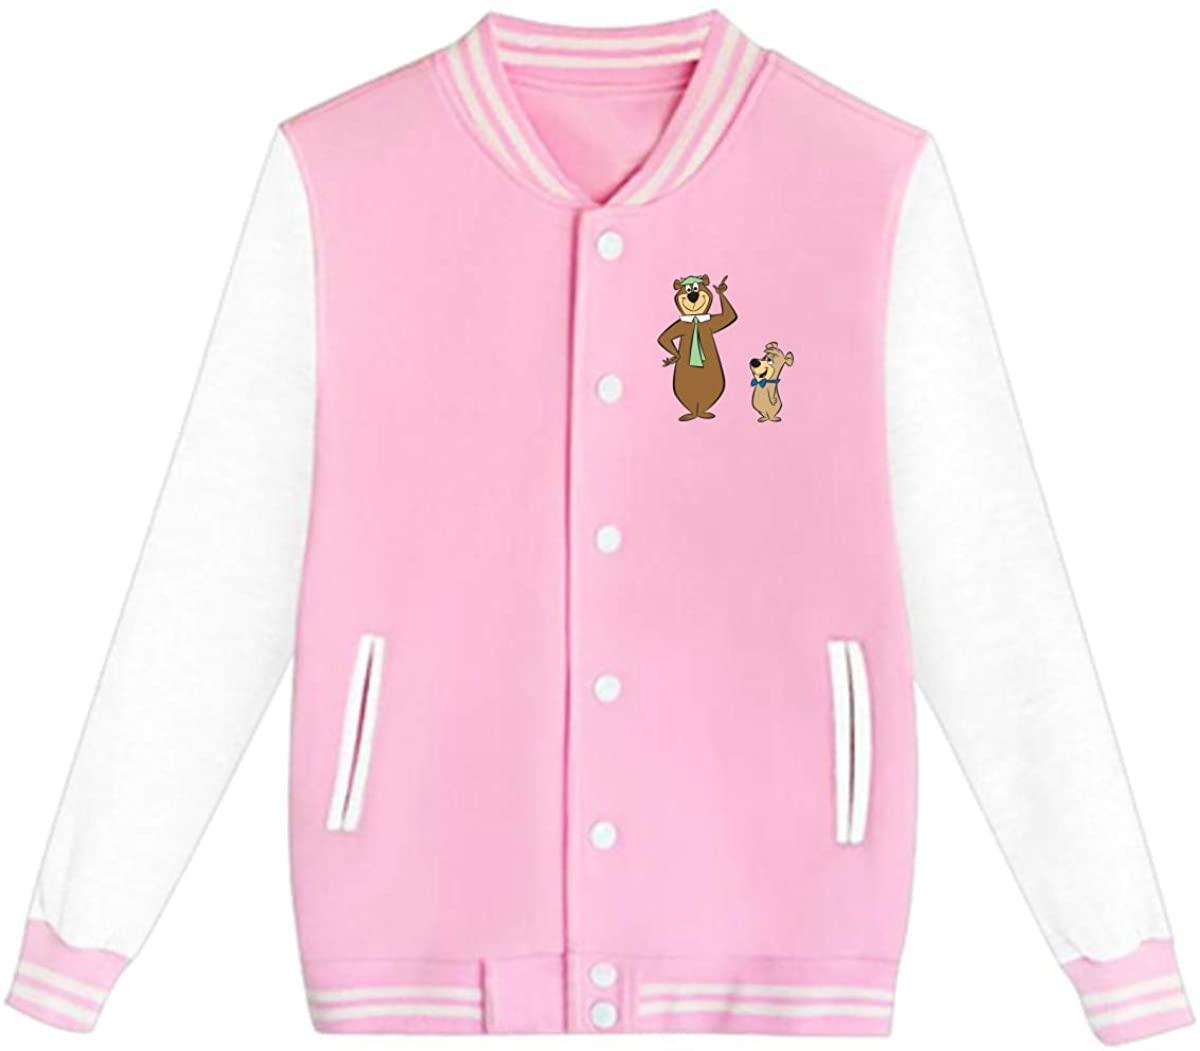 AHUAHUA Yogi Bear and Boo Boo Unisex Youth Boys and Girls Sweatshirt Baseball Uniform Jacket Sport Coat